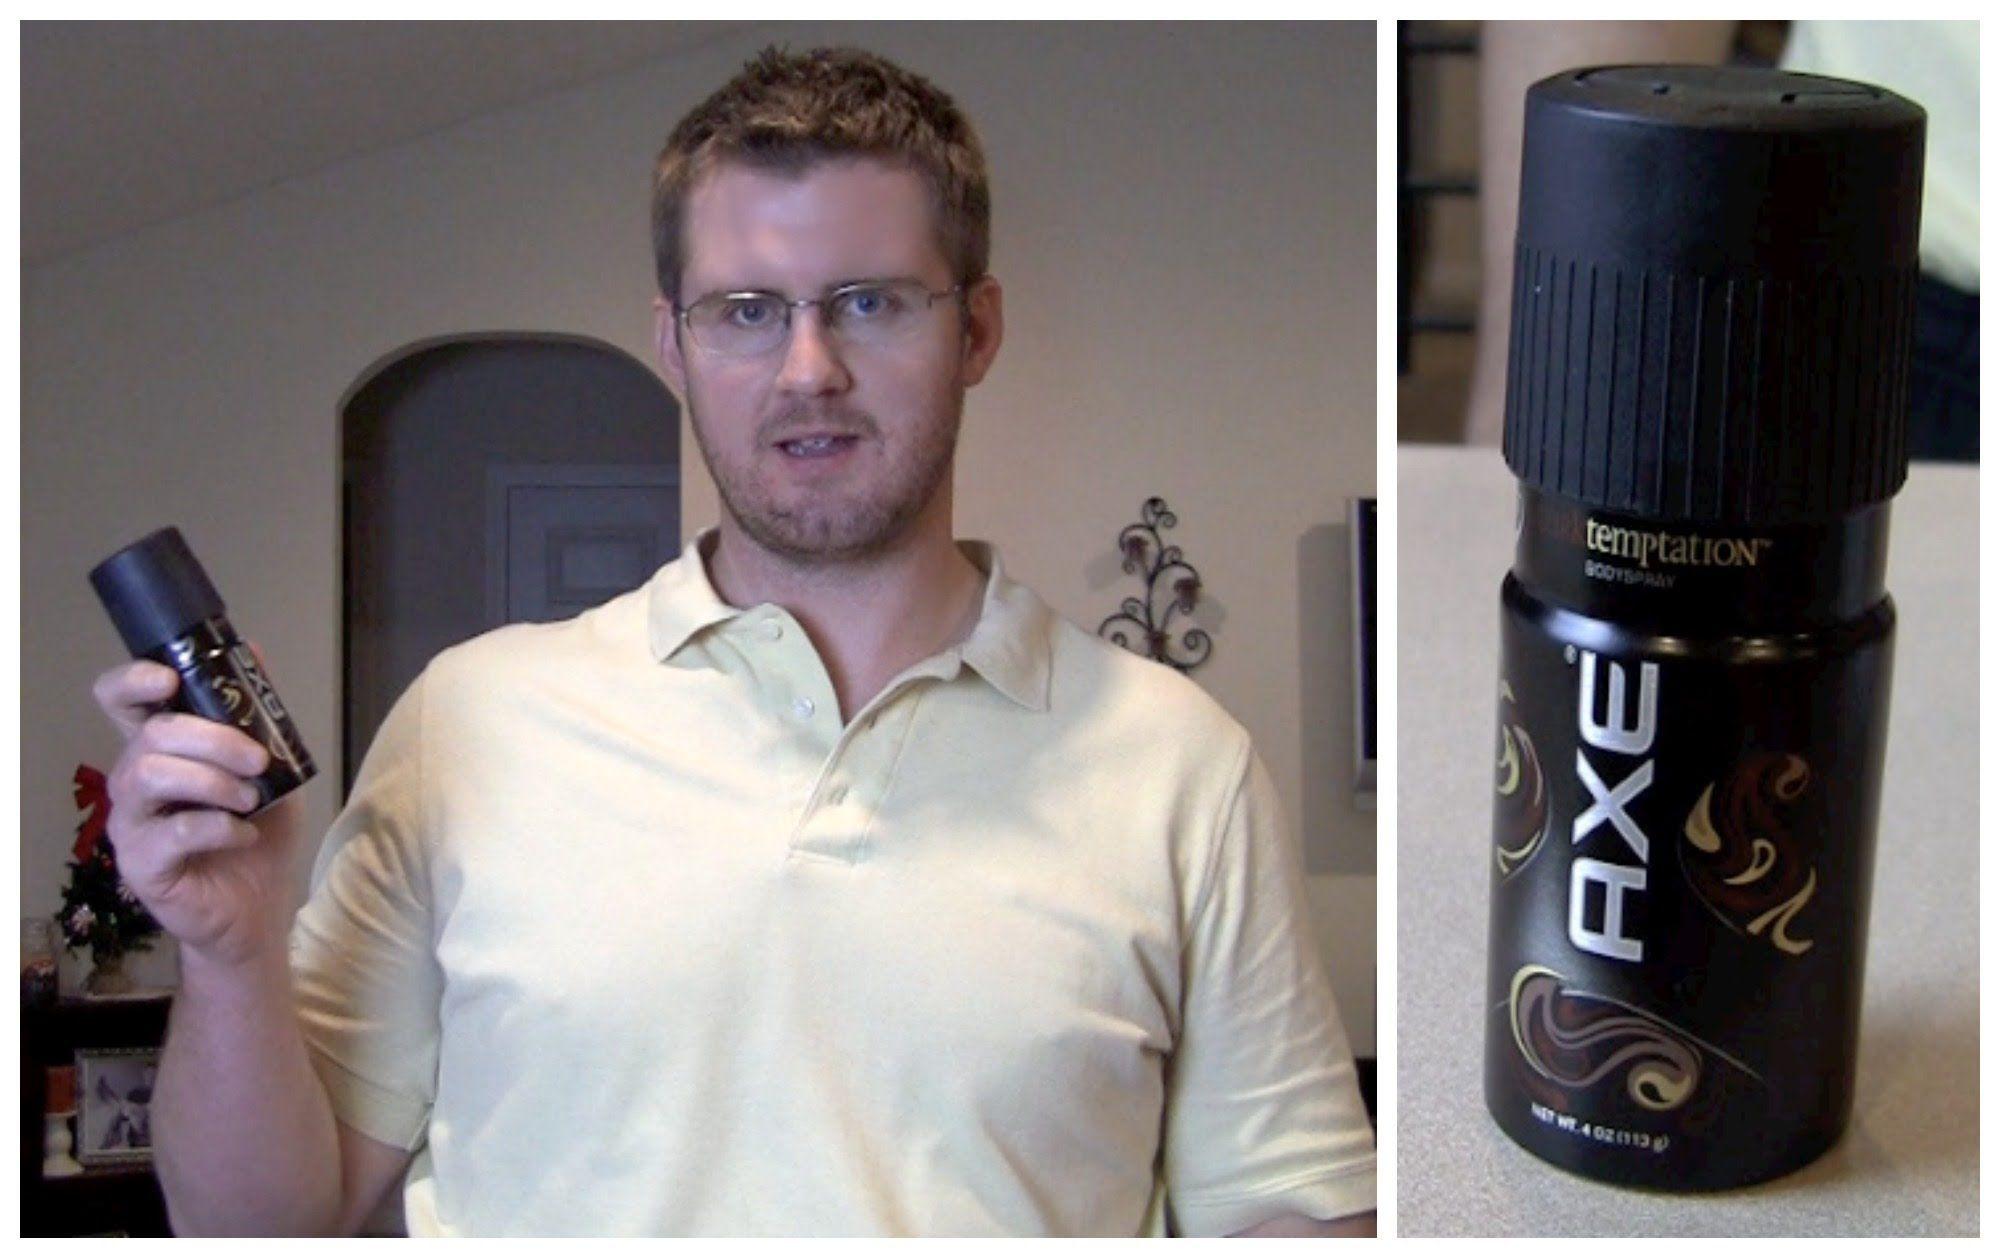 Axe Dark Temptation Body Spray Review Tylers Reviews Pinterest Deodorant Twist 150 Ml